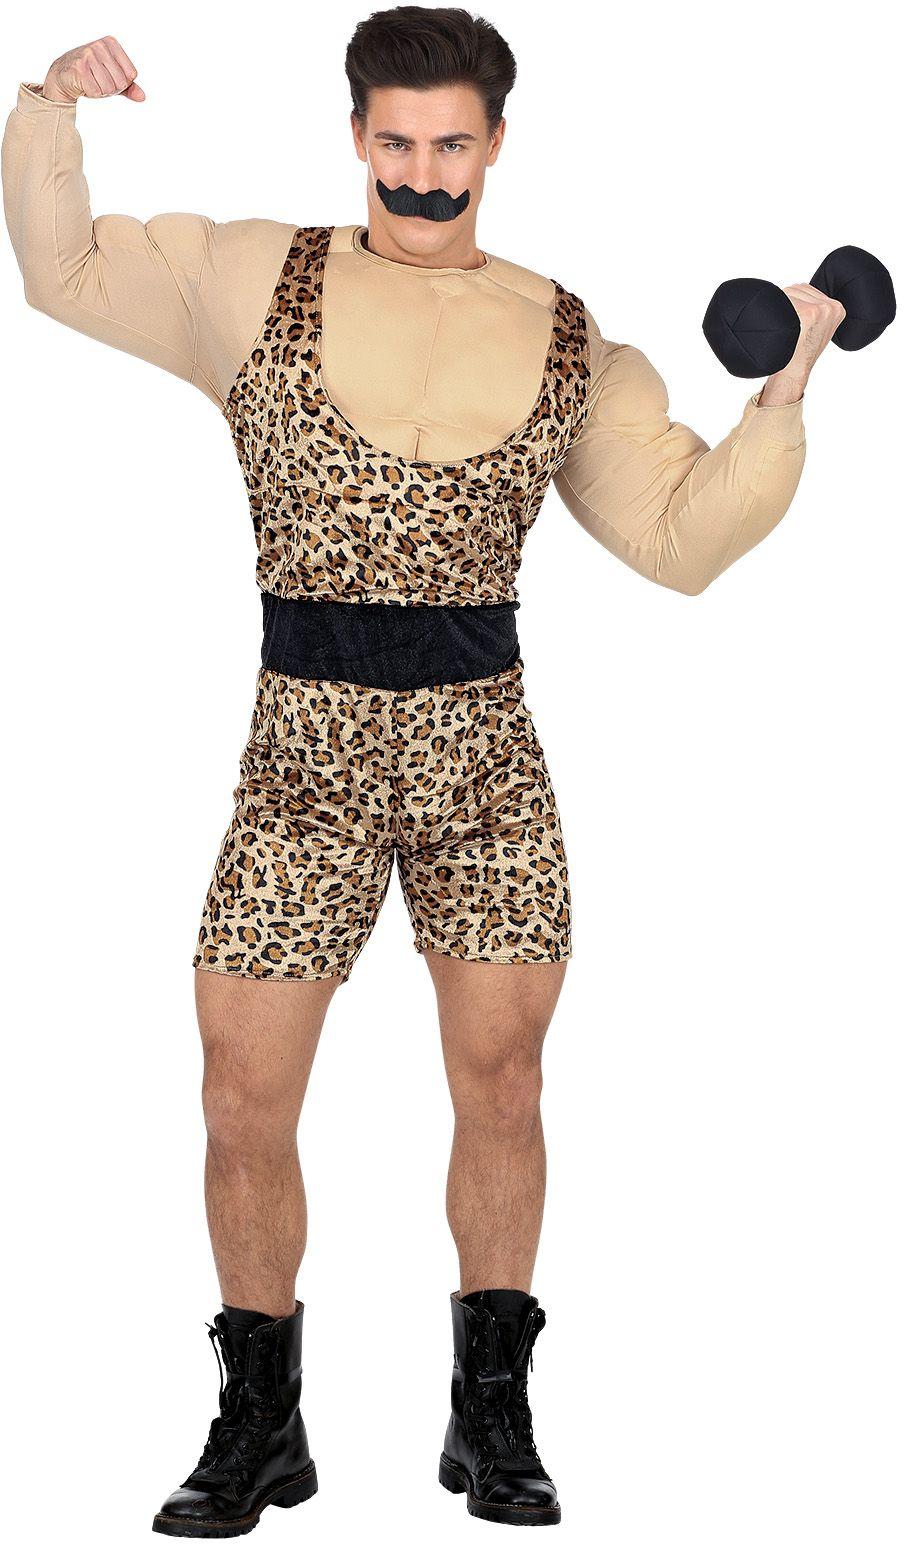 Sterke man in panterprint kostuum